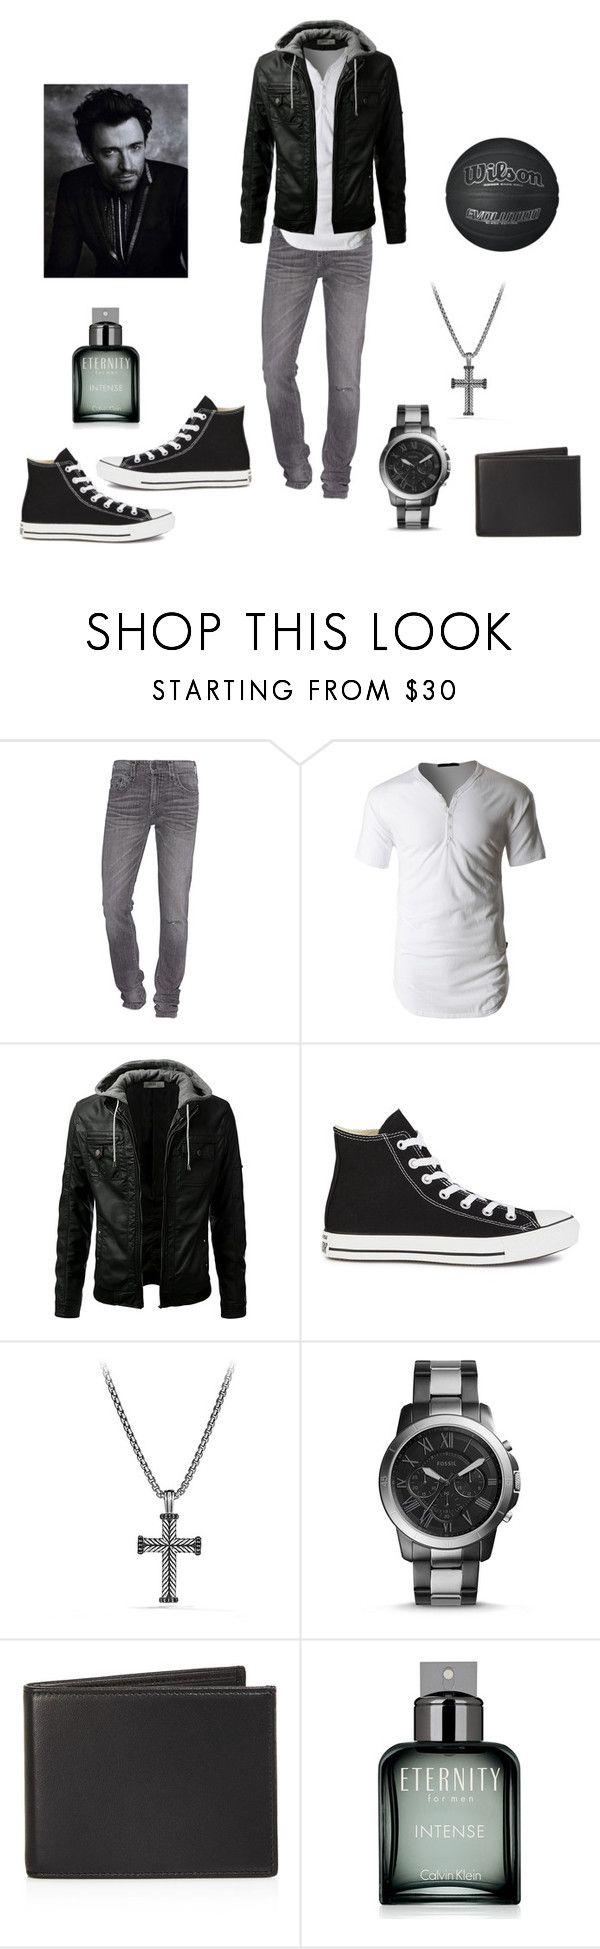 """Black and white"" by jessiestarman ❤ liked on Polyvore featuring True Religion, LE3NO, Converse, David Yurman, FOSSIL, The Men's Store, Calvin Klein, men's fashion and menswear"